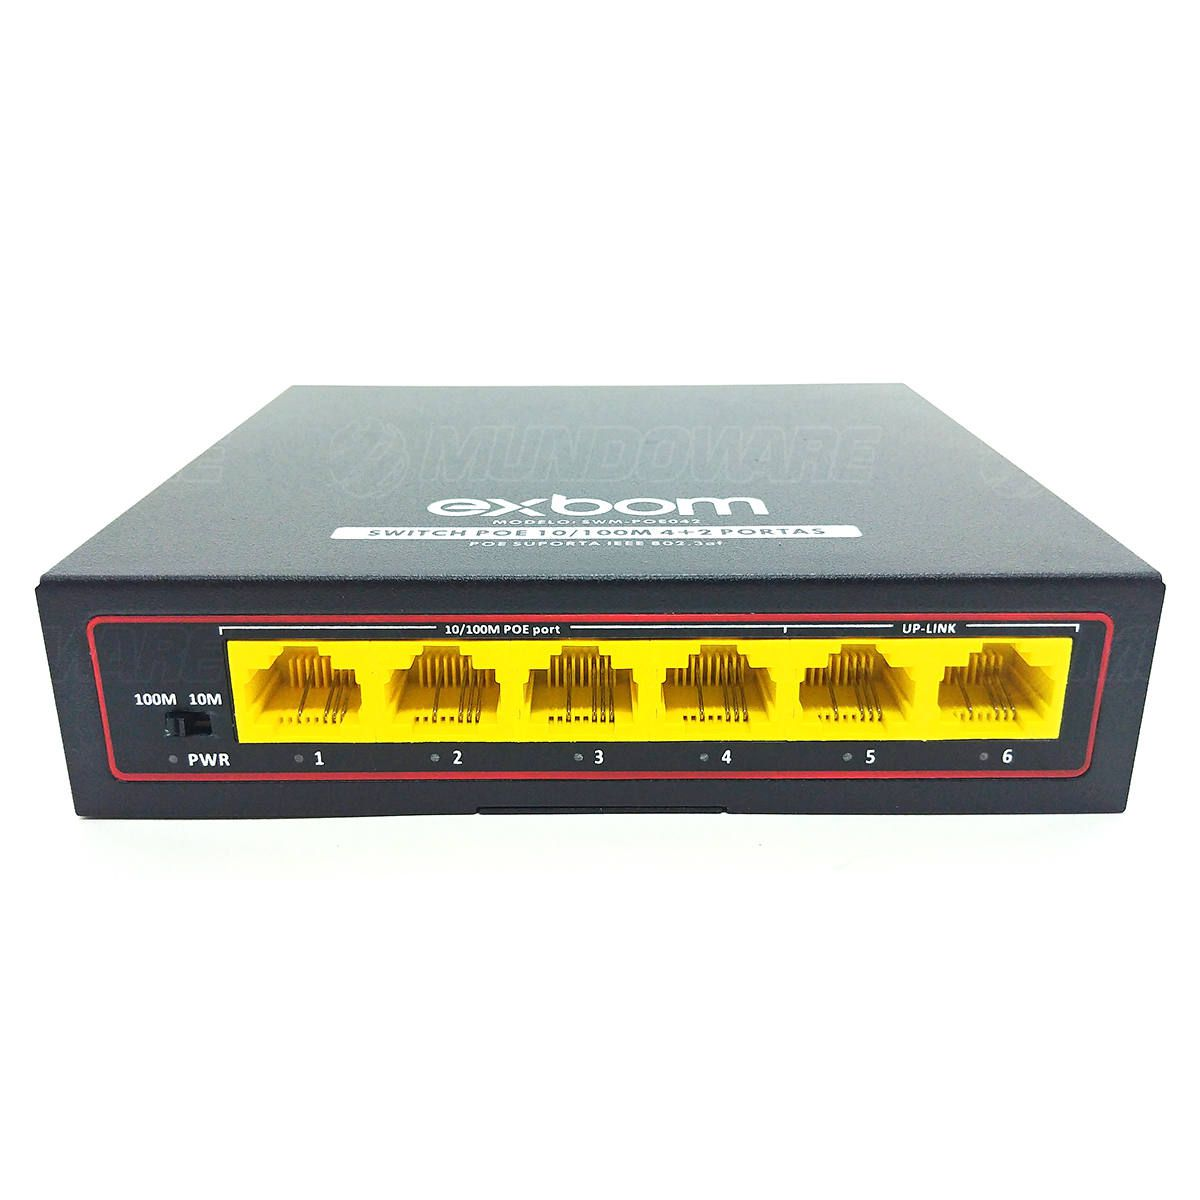 Switch POE 100Mbps 4 Portas + 2 Portas Uplink Dual Speed Exbom SWM-POE042M